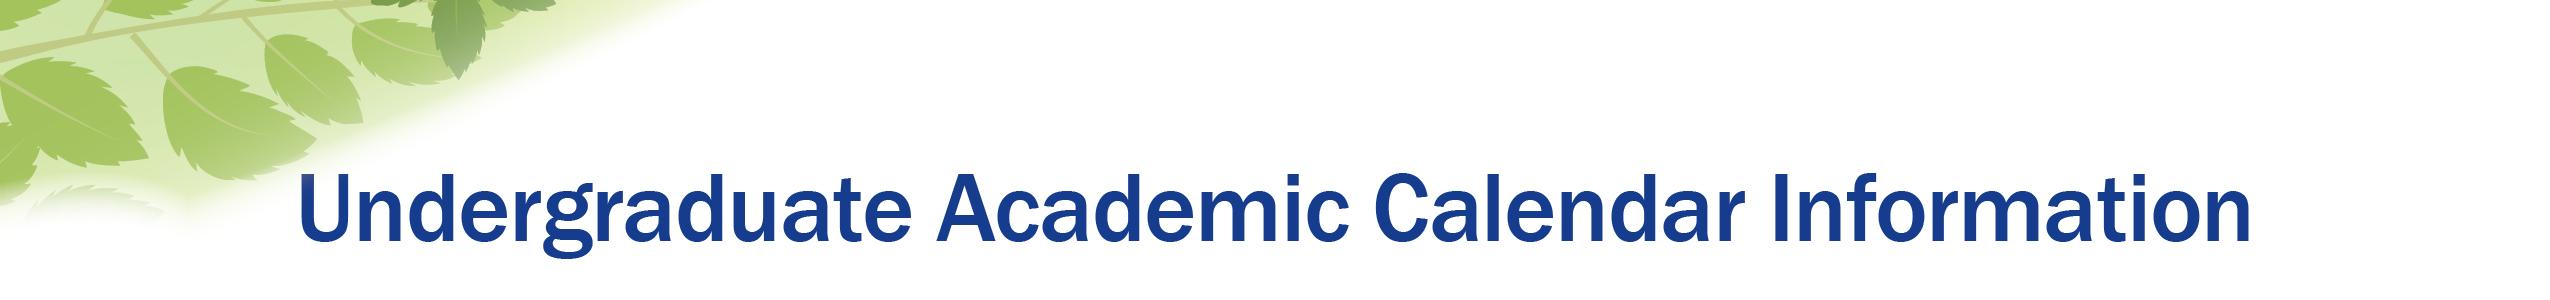 Undergraduate Academic Calendar information header